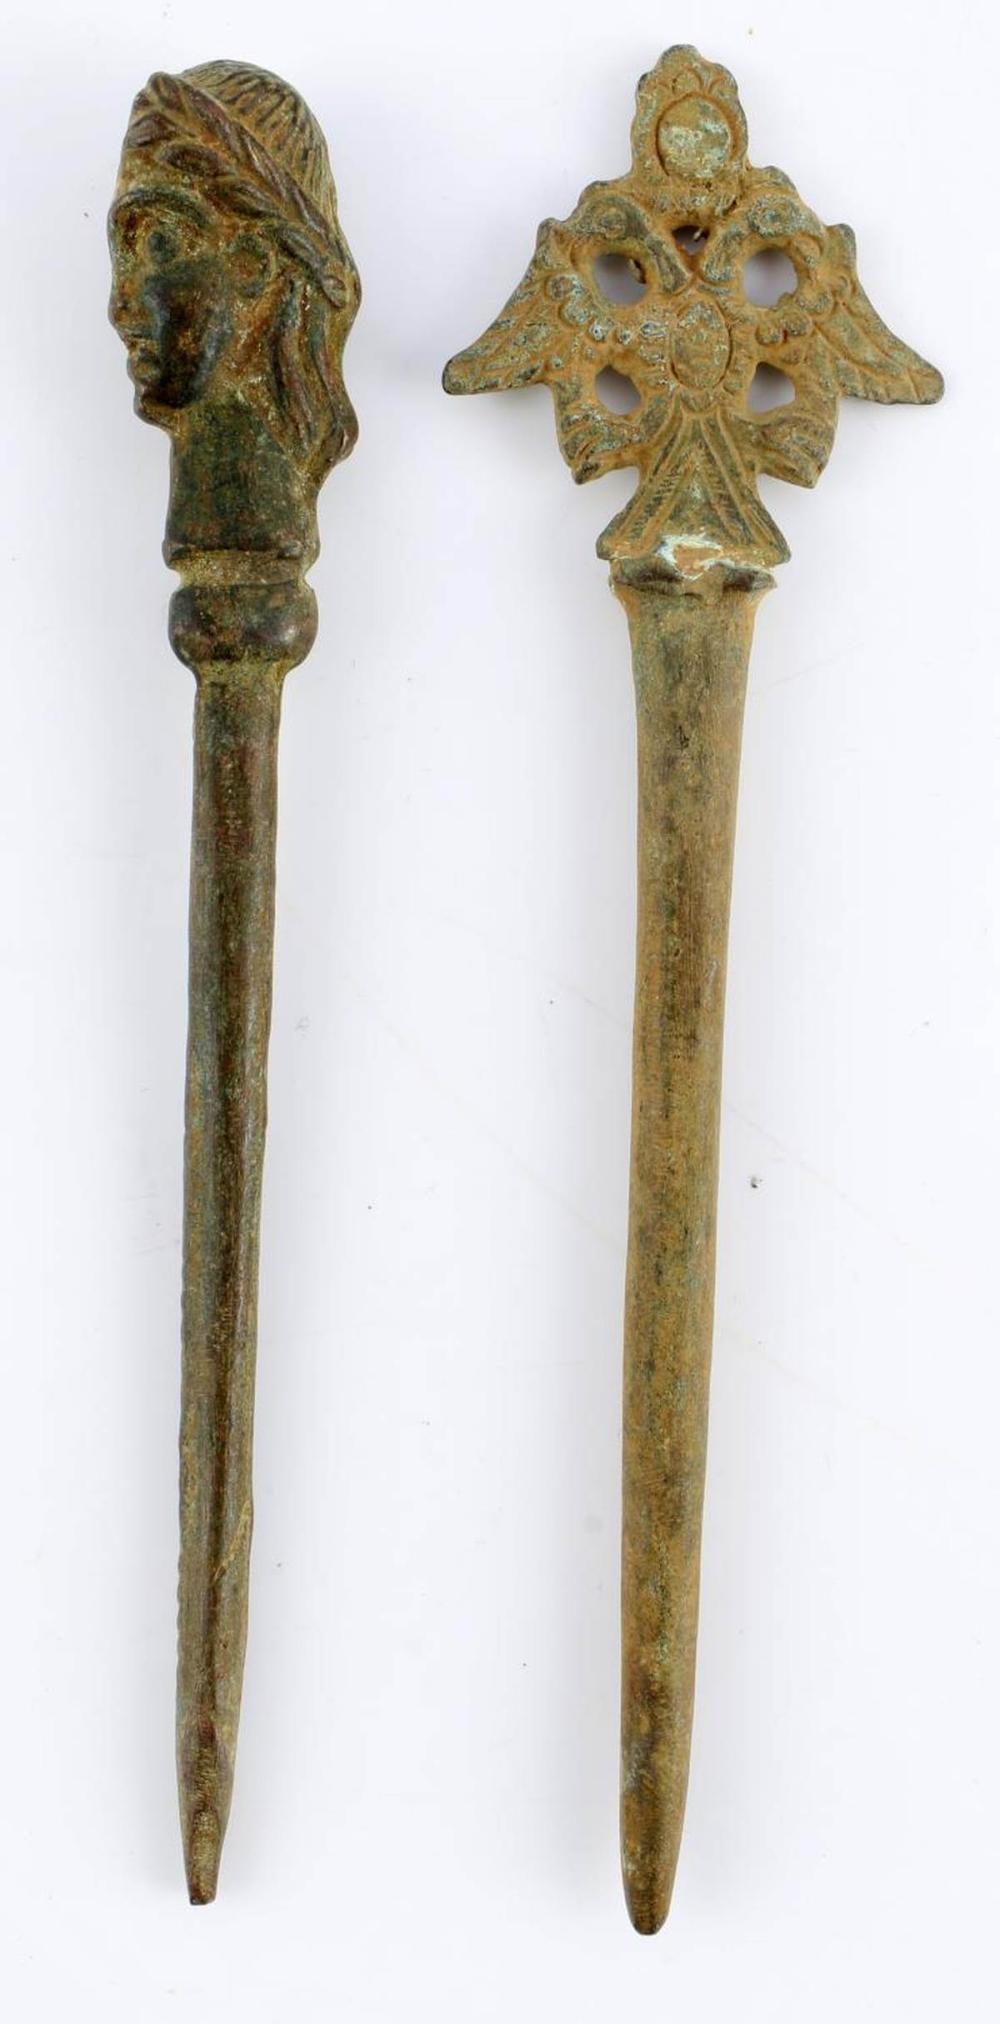 2 ANCIENT ROMAN BRONZE HAIR PINS OR STYLUS